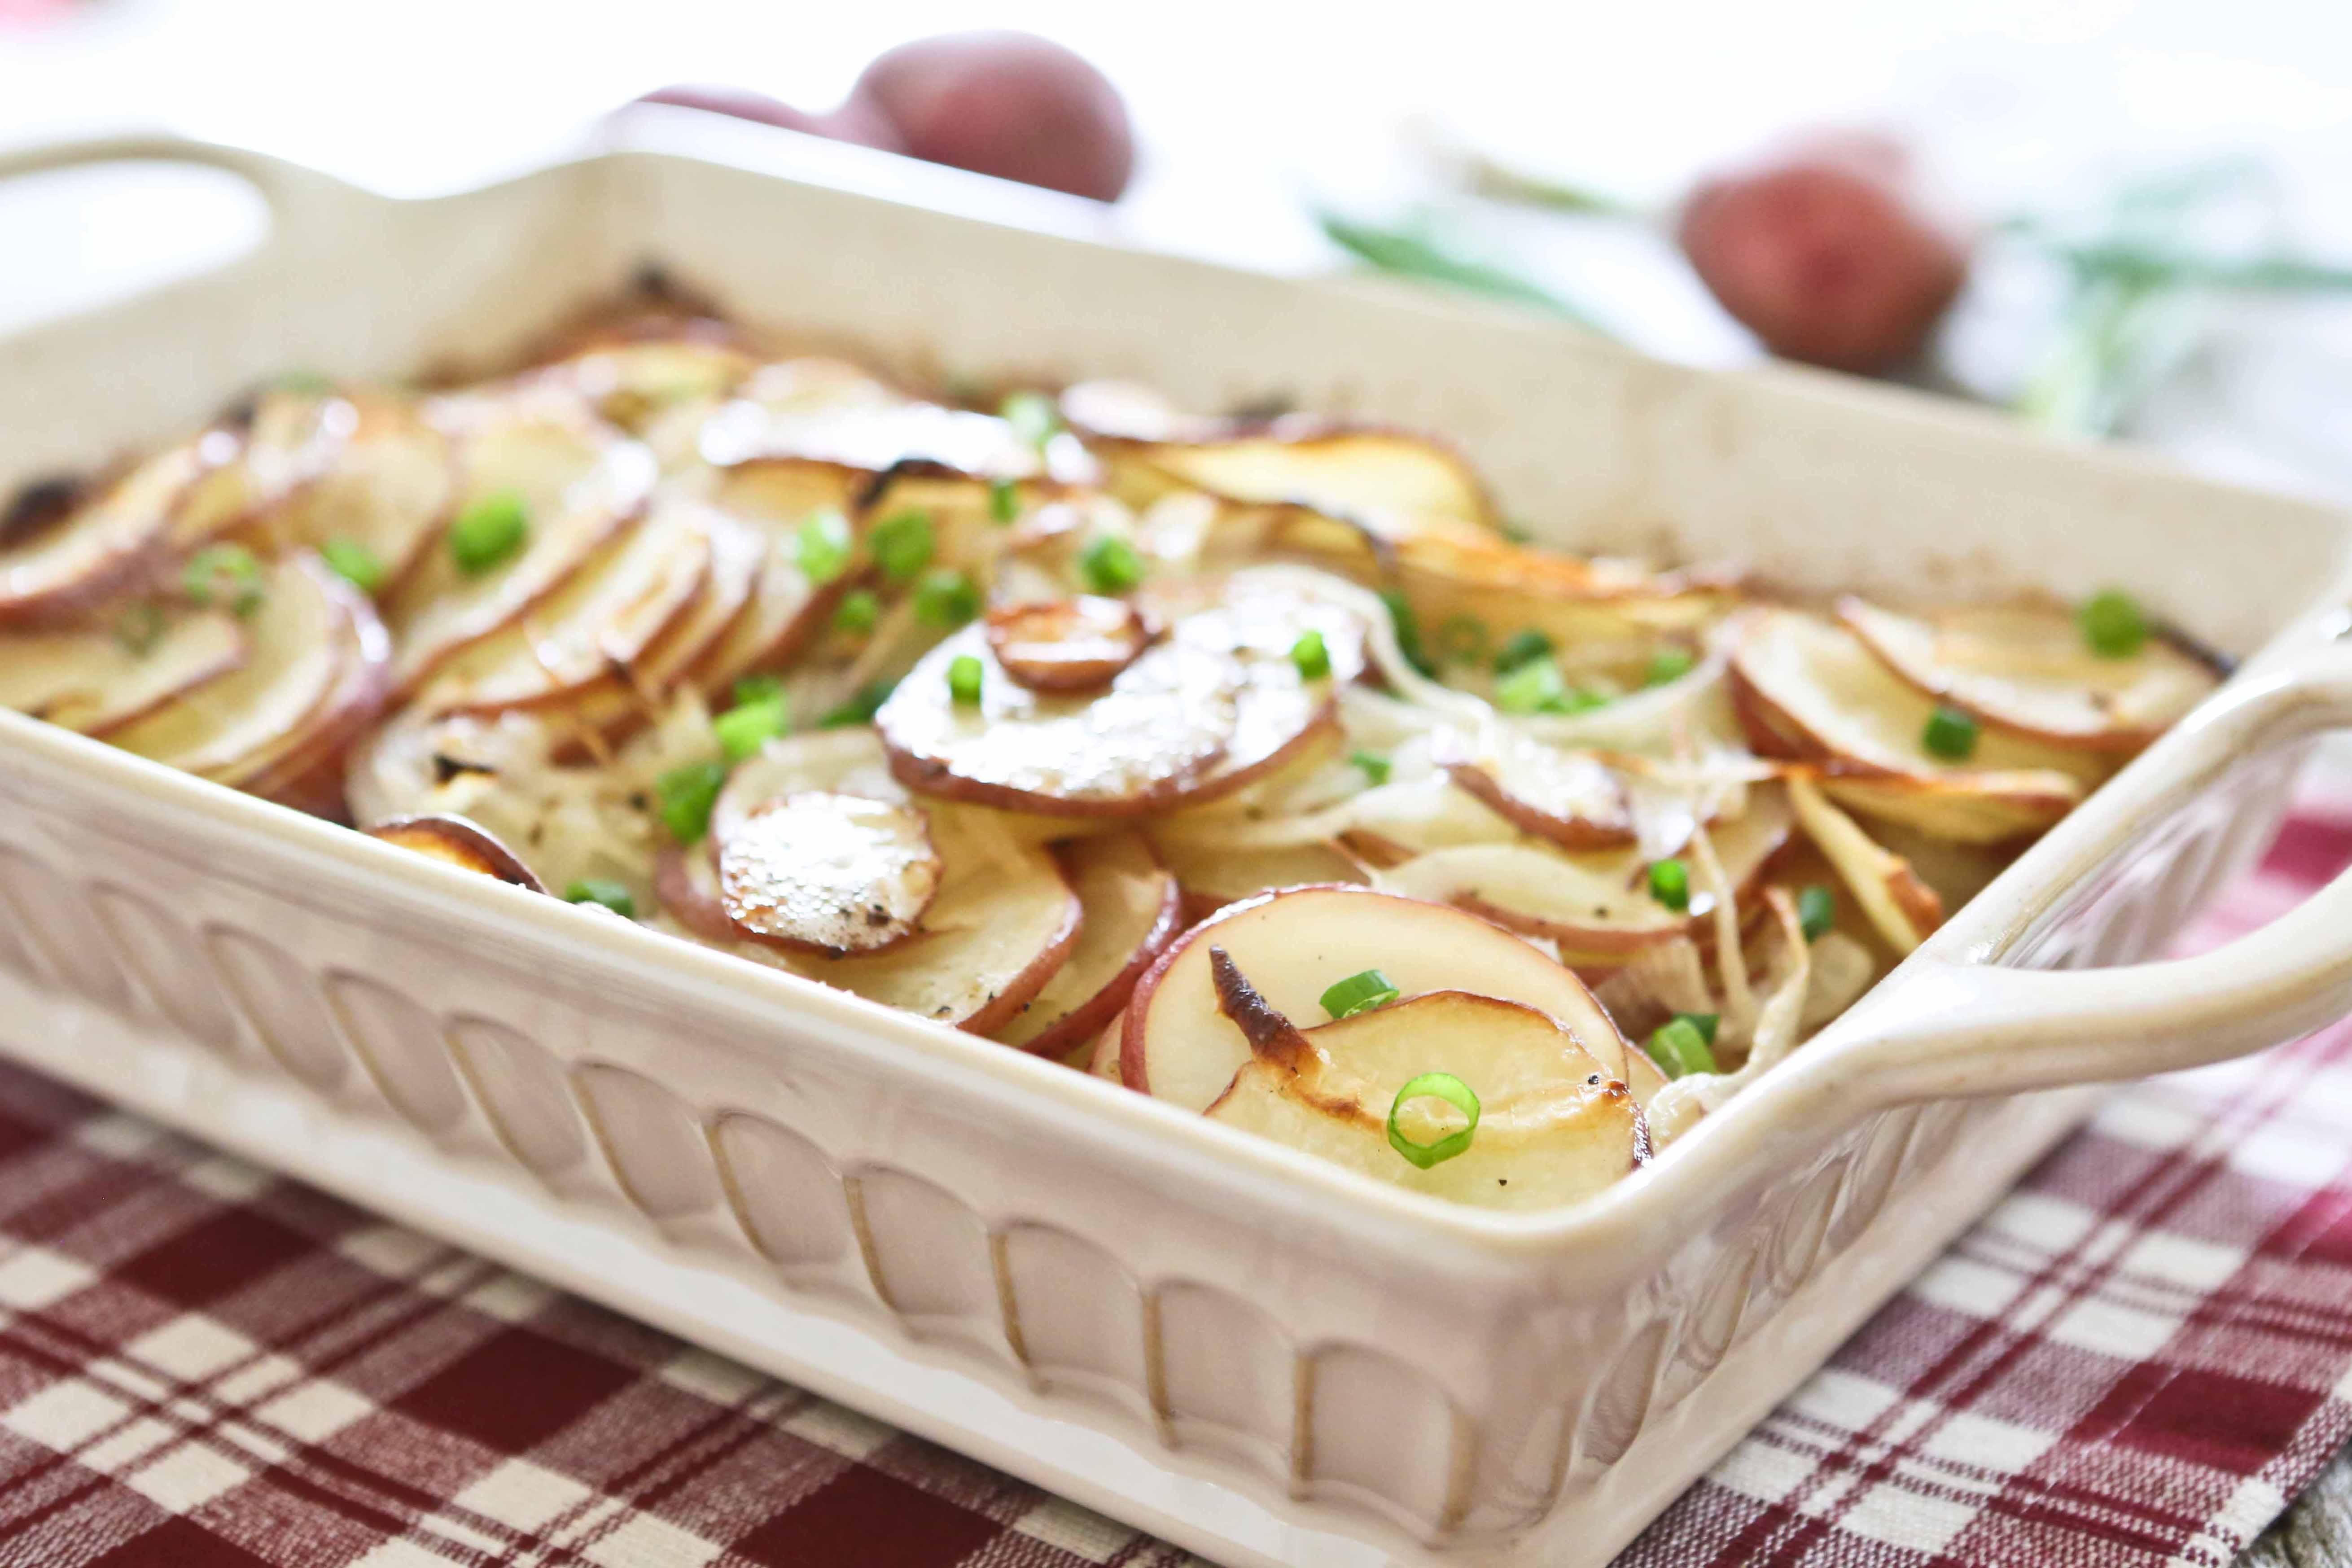 Roasted Sliced Potatoes